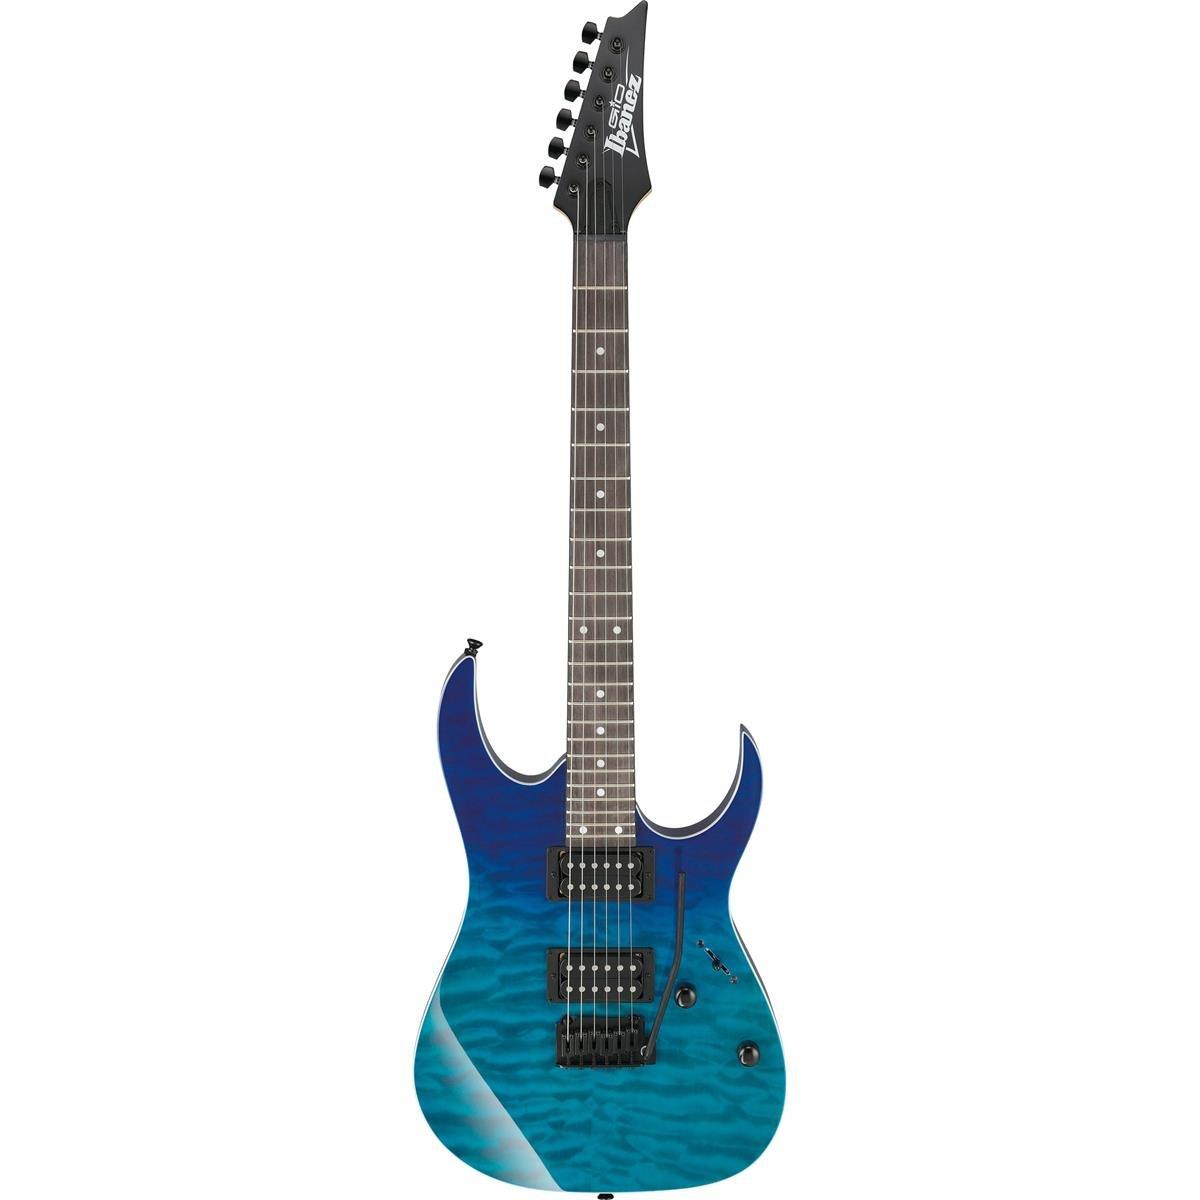 (Pre-Order) Ibanez GRG120QASP Gio Electric Guitar - Blue Gradation